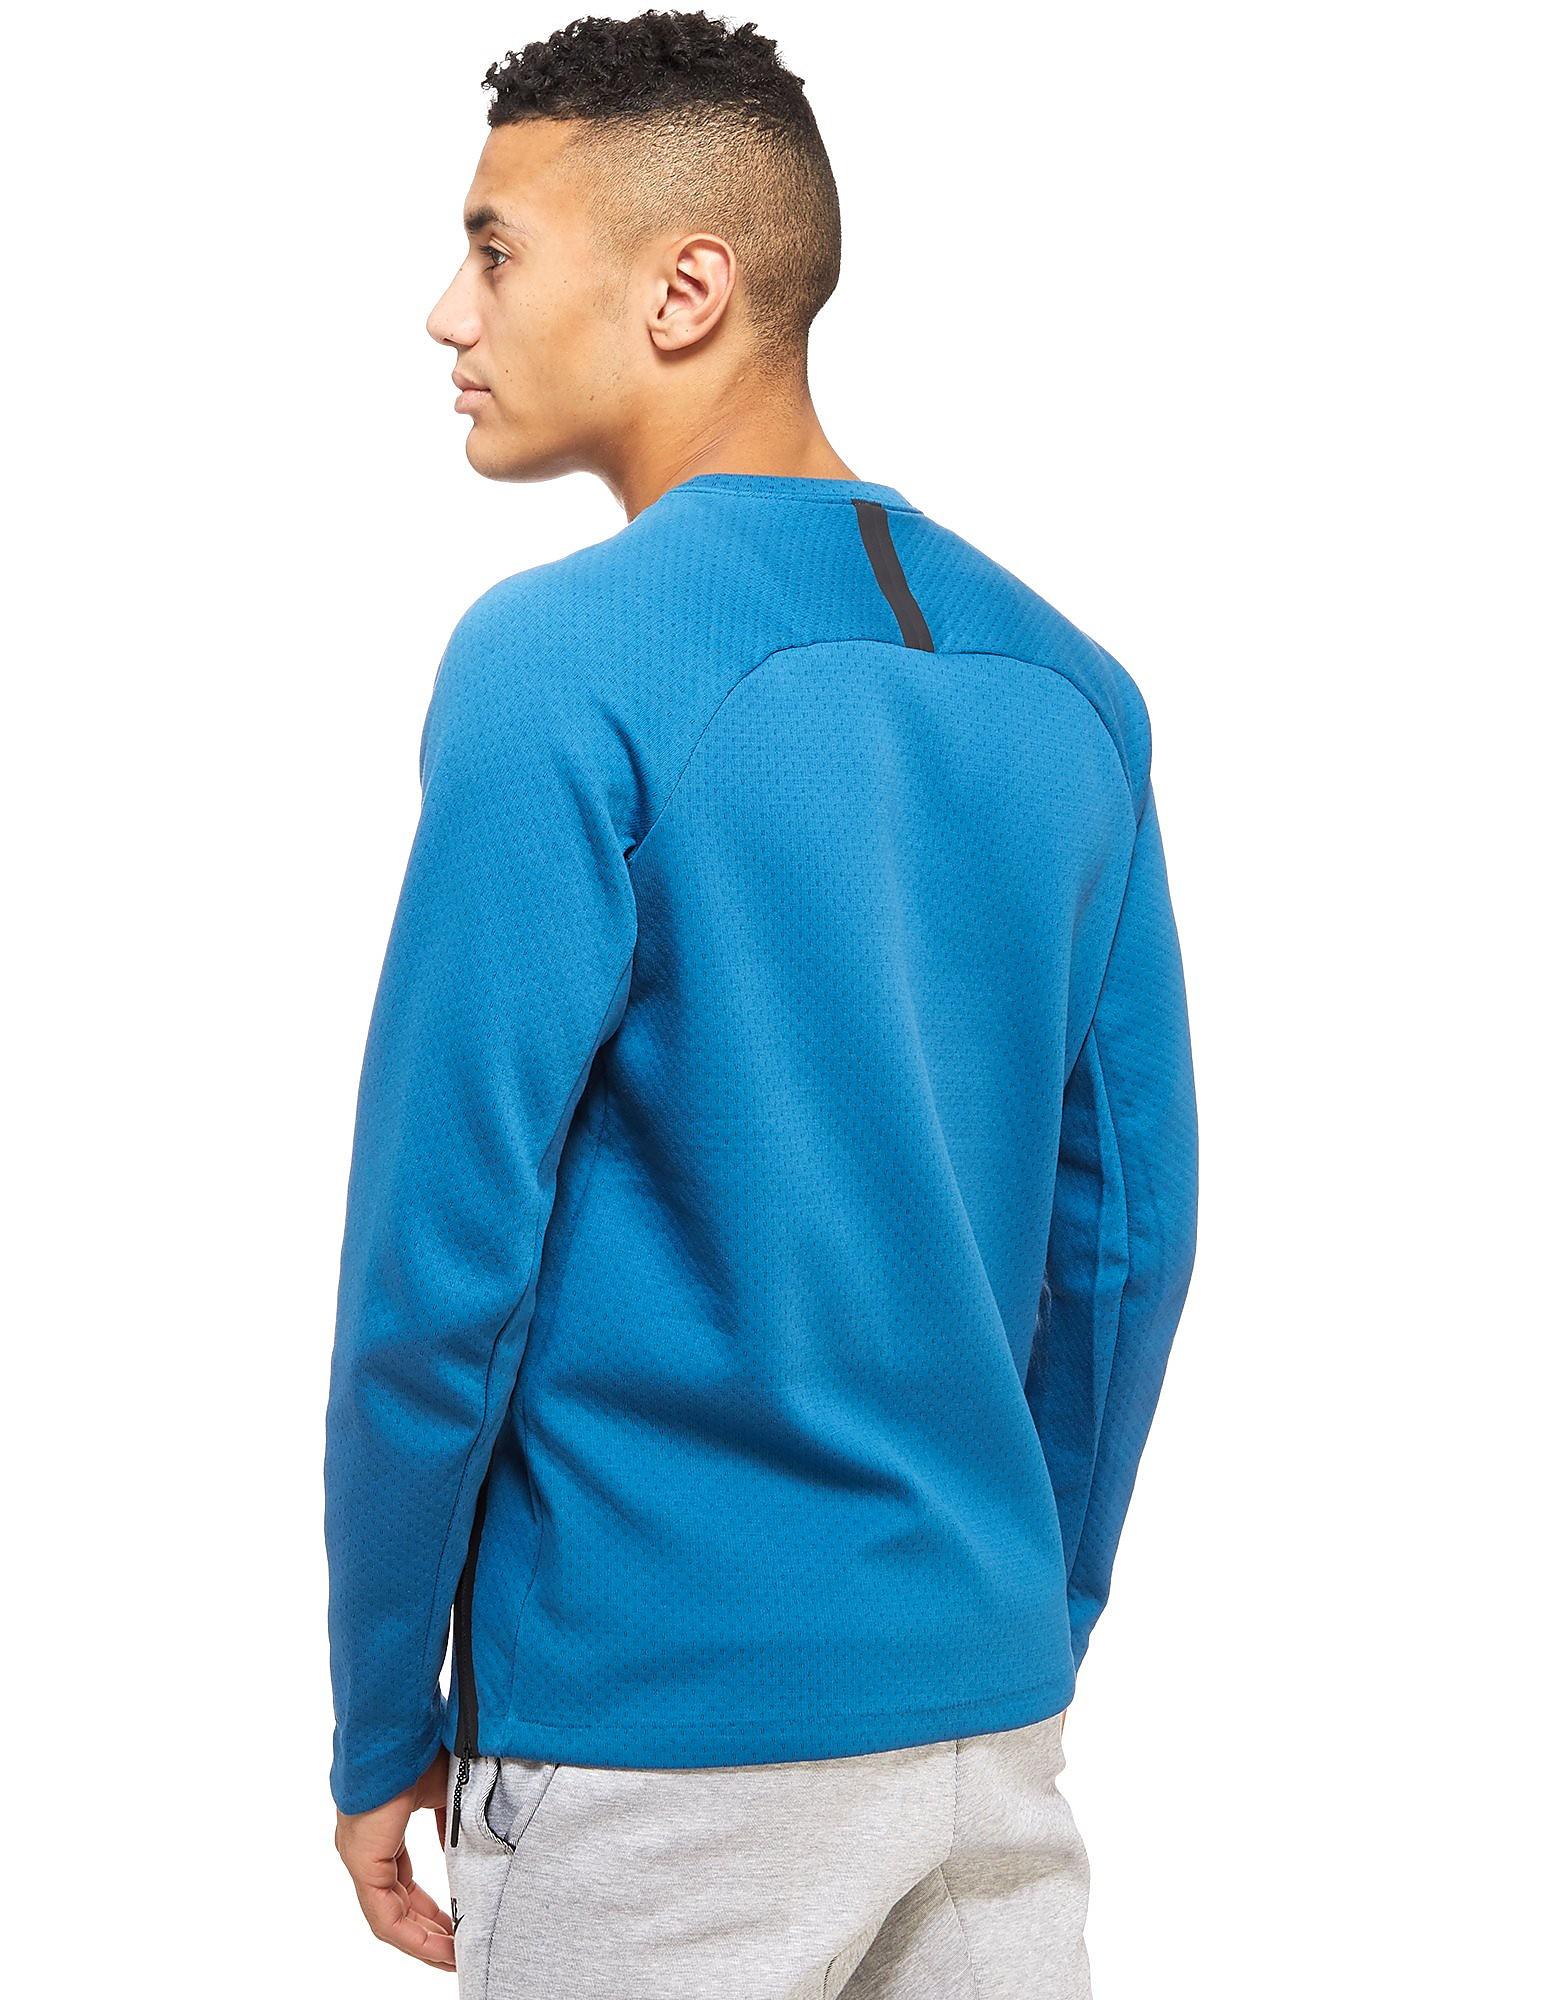 Nike Tech Season Crew Sweatshirt